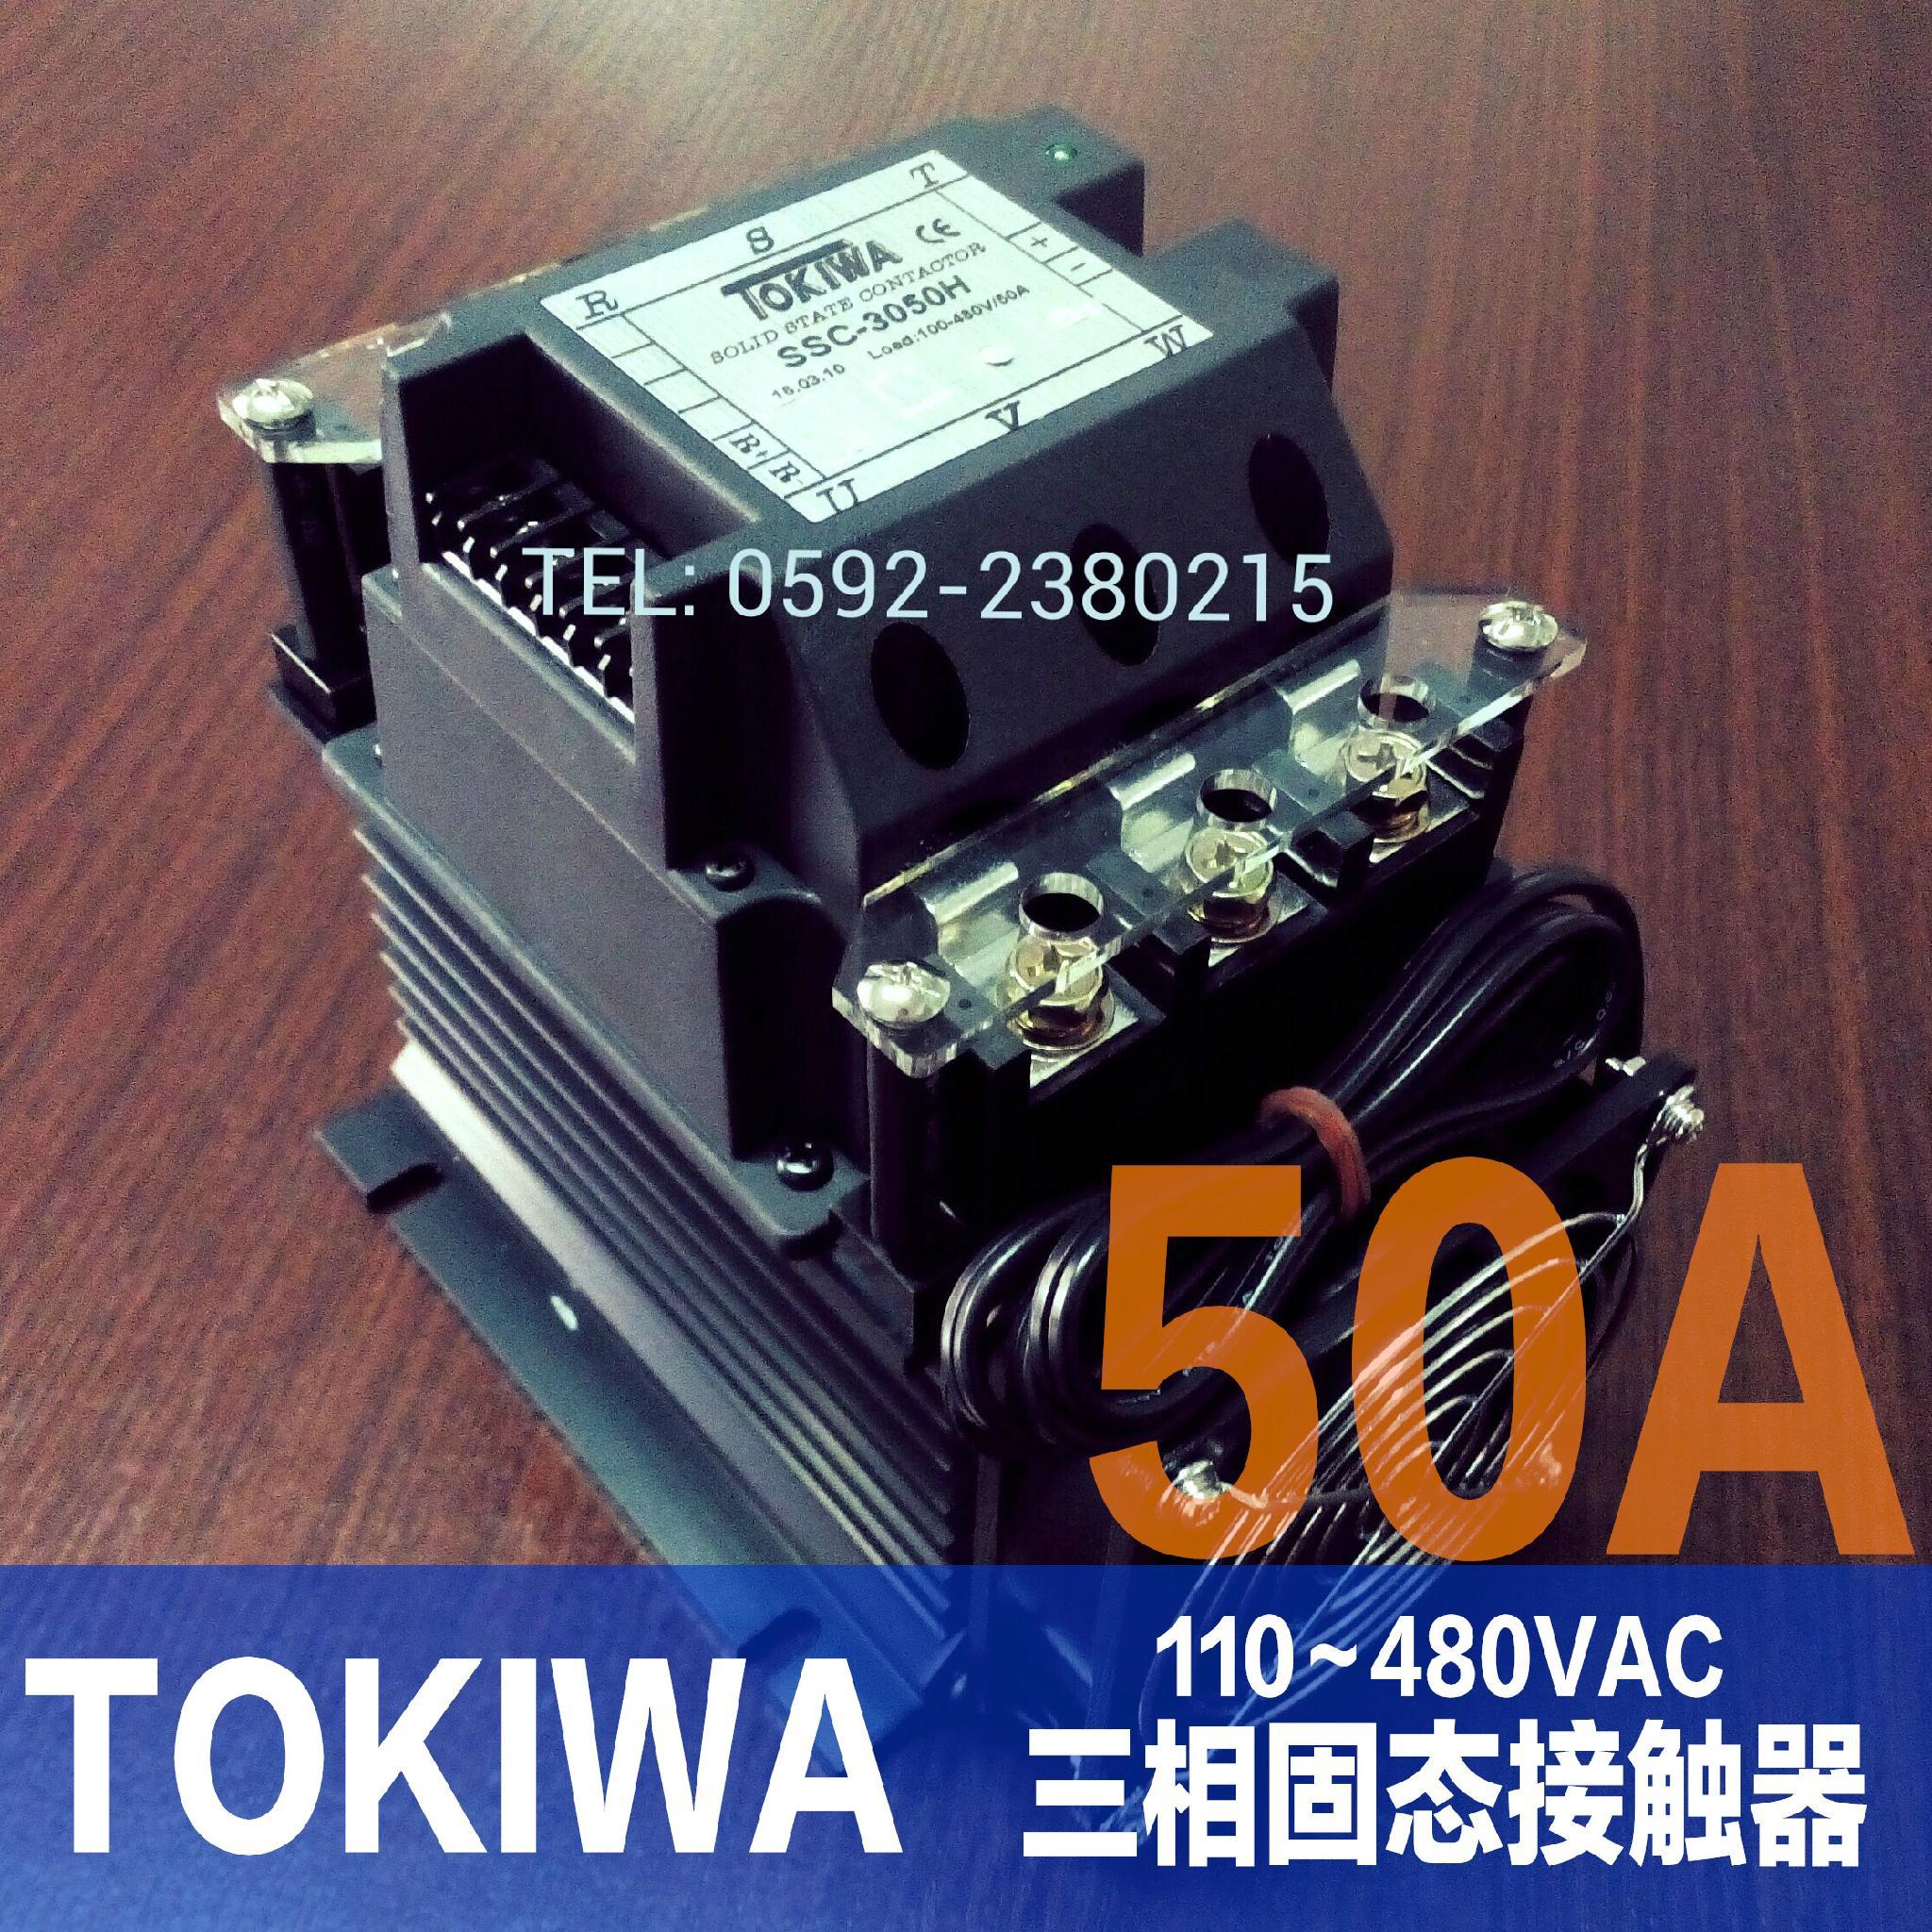 TOKIWA TOPTAWA SSC-3050HL